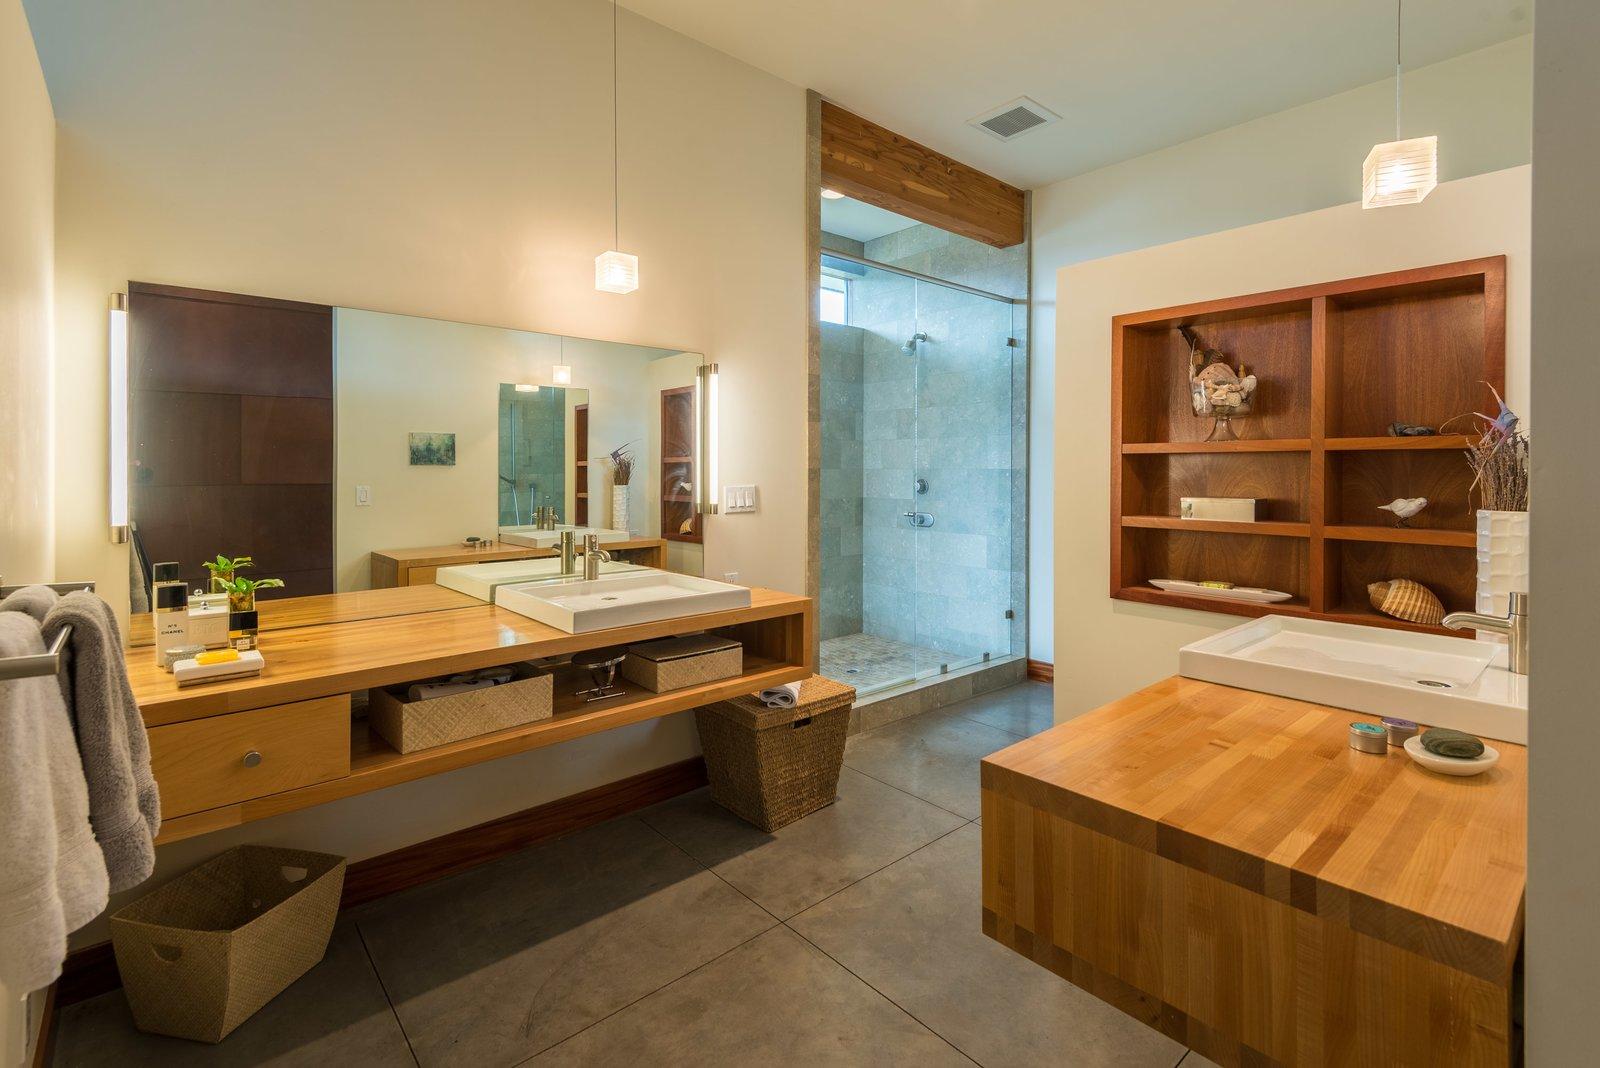 Bath Room, Wood Counter, Concrete Floor, Vessel Sink, Pendant Lighting, Stone Tile Wall, Enclosed Shower, Full Shower, and Corner Shower Master Bath  High Desert Pavillion